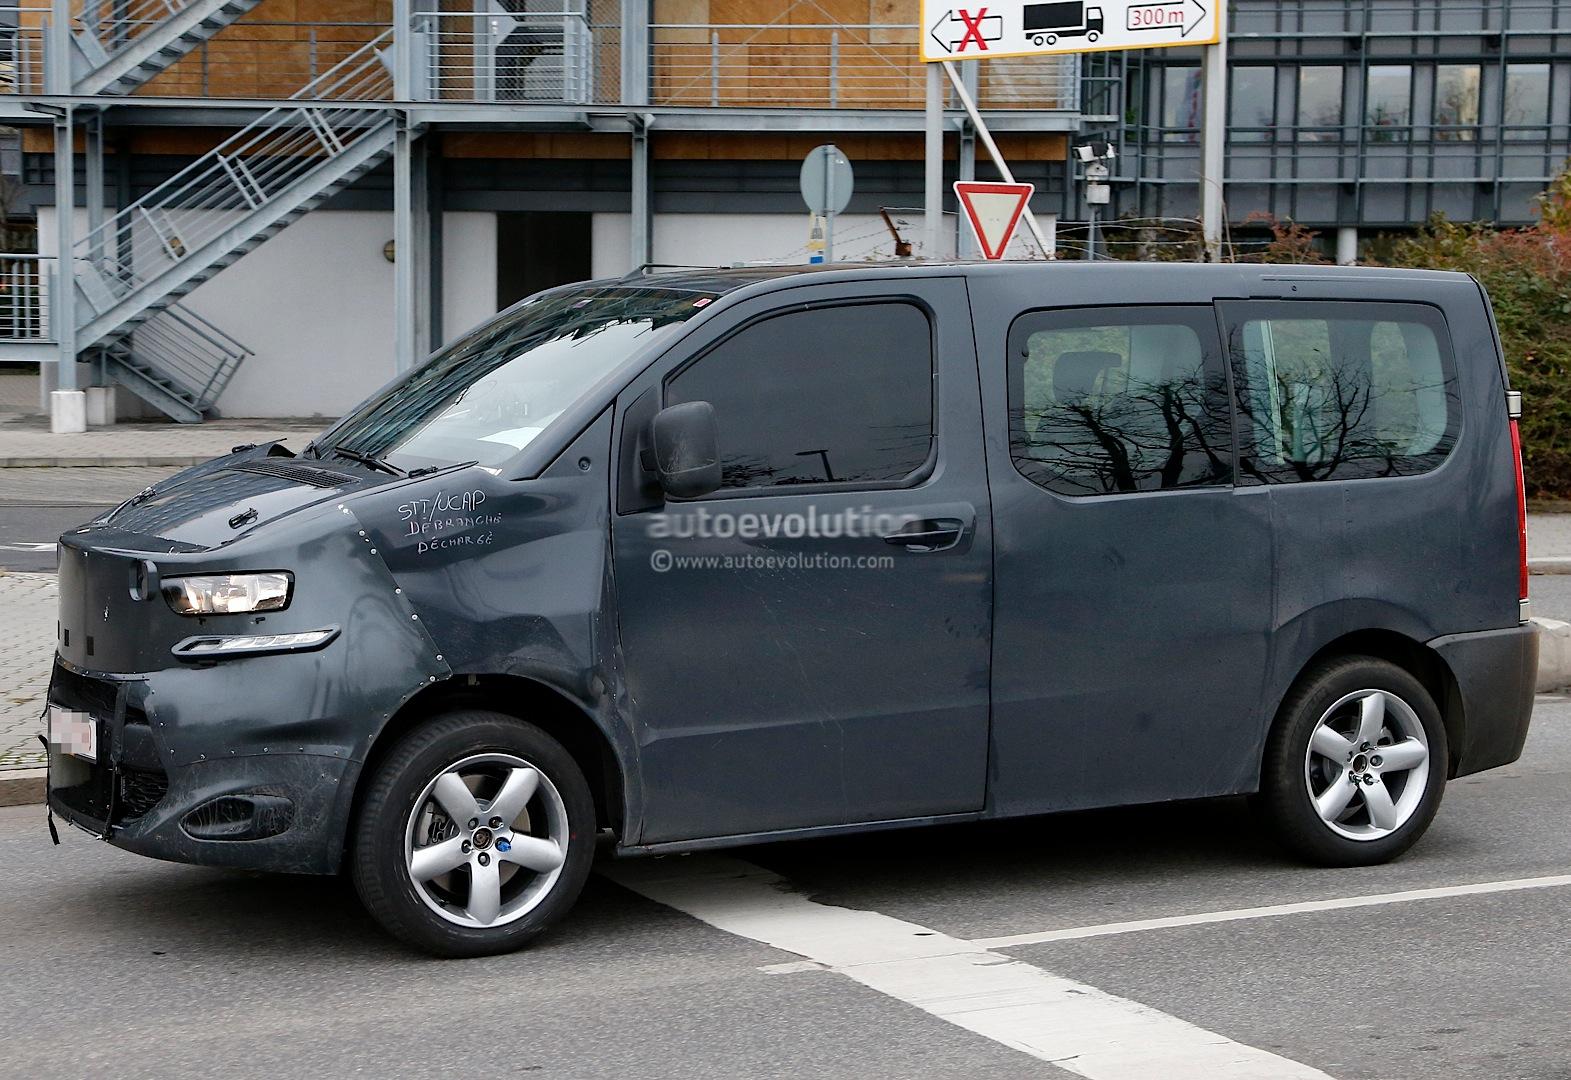 2016 - [Citroën/Peugeot/Toyota] SpaceTourer/Traveller/ProAce Spyshots-new-citroen-jumpy-takes-cues-from-2011-tubik-concept-1080p-3